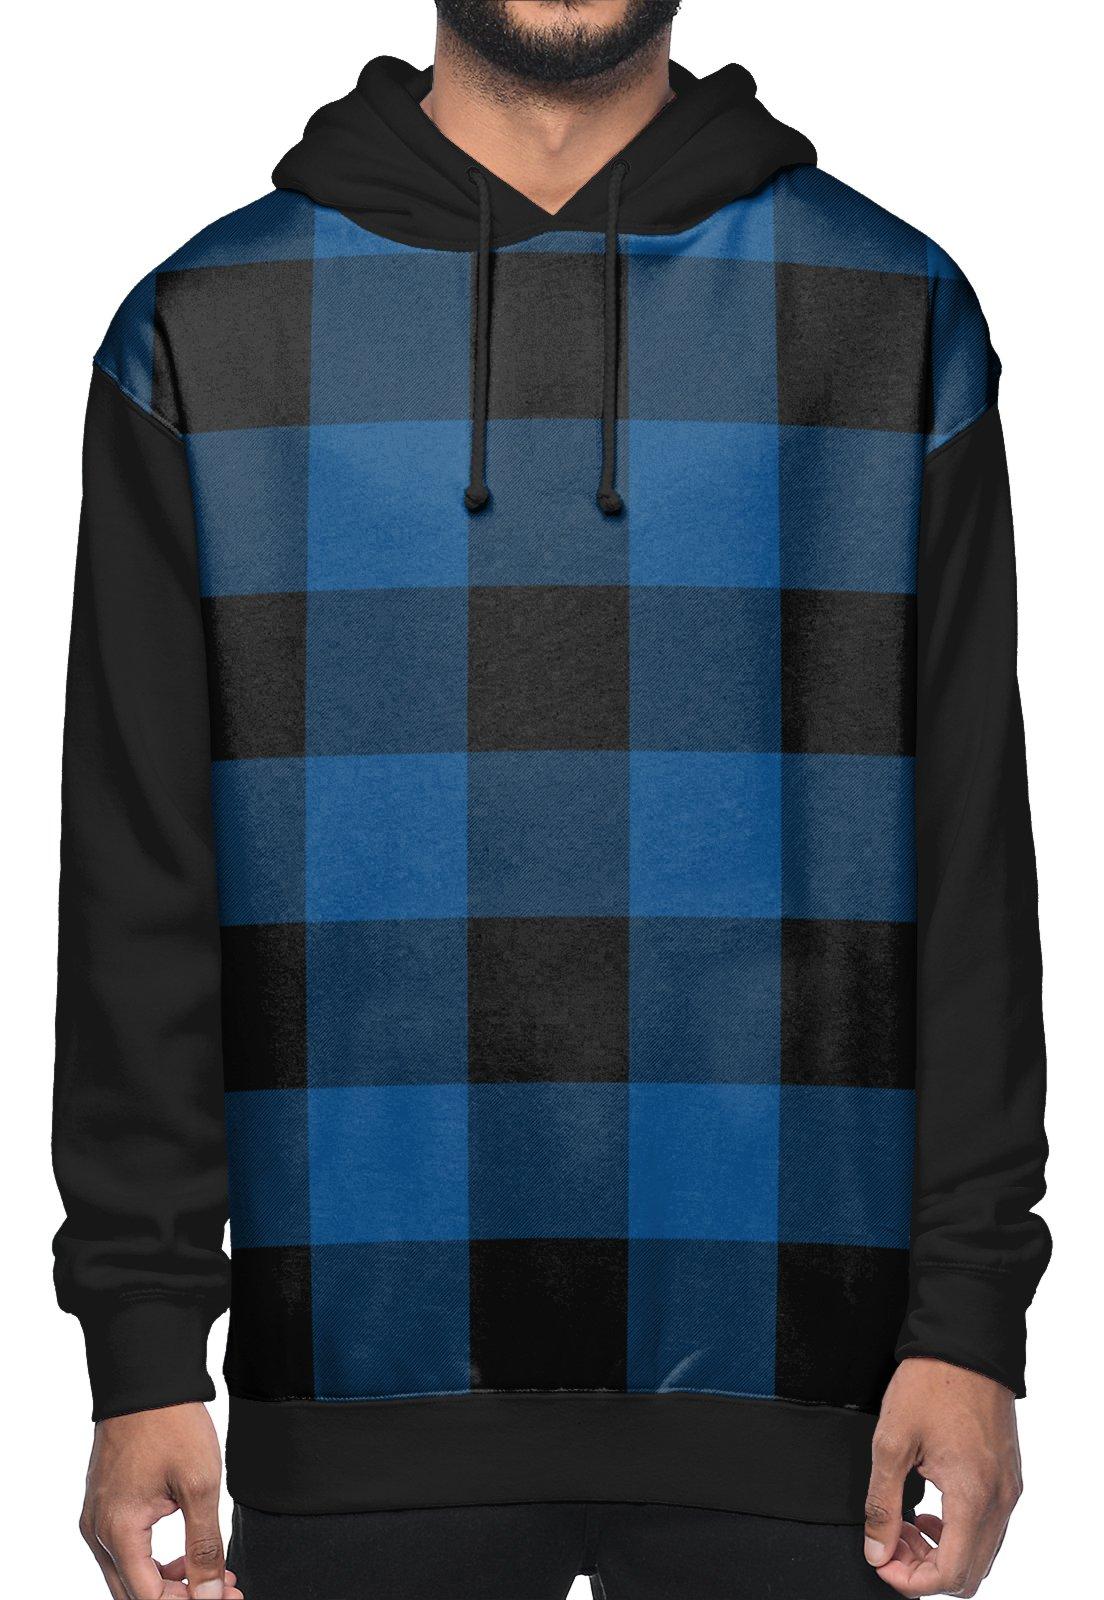 39cfef2d9e Camisa xadrez – história e estilos